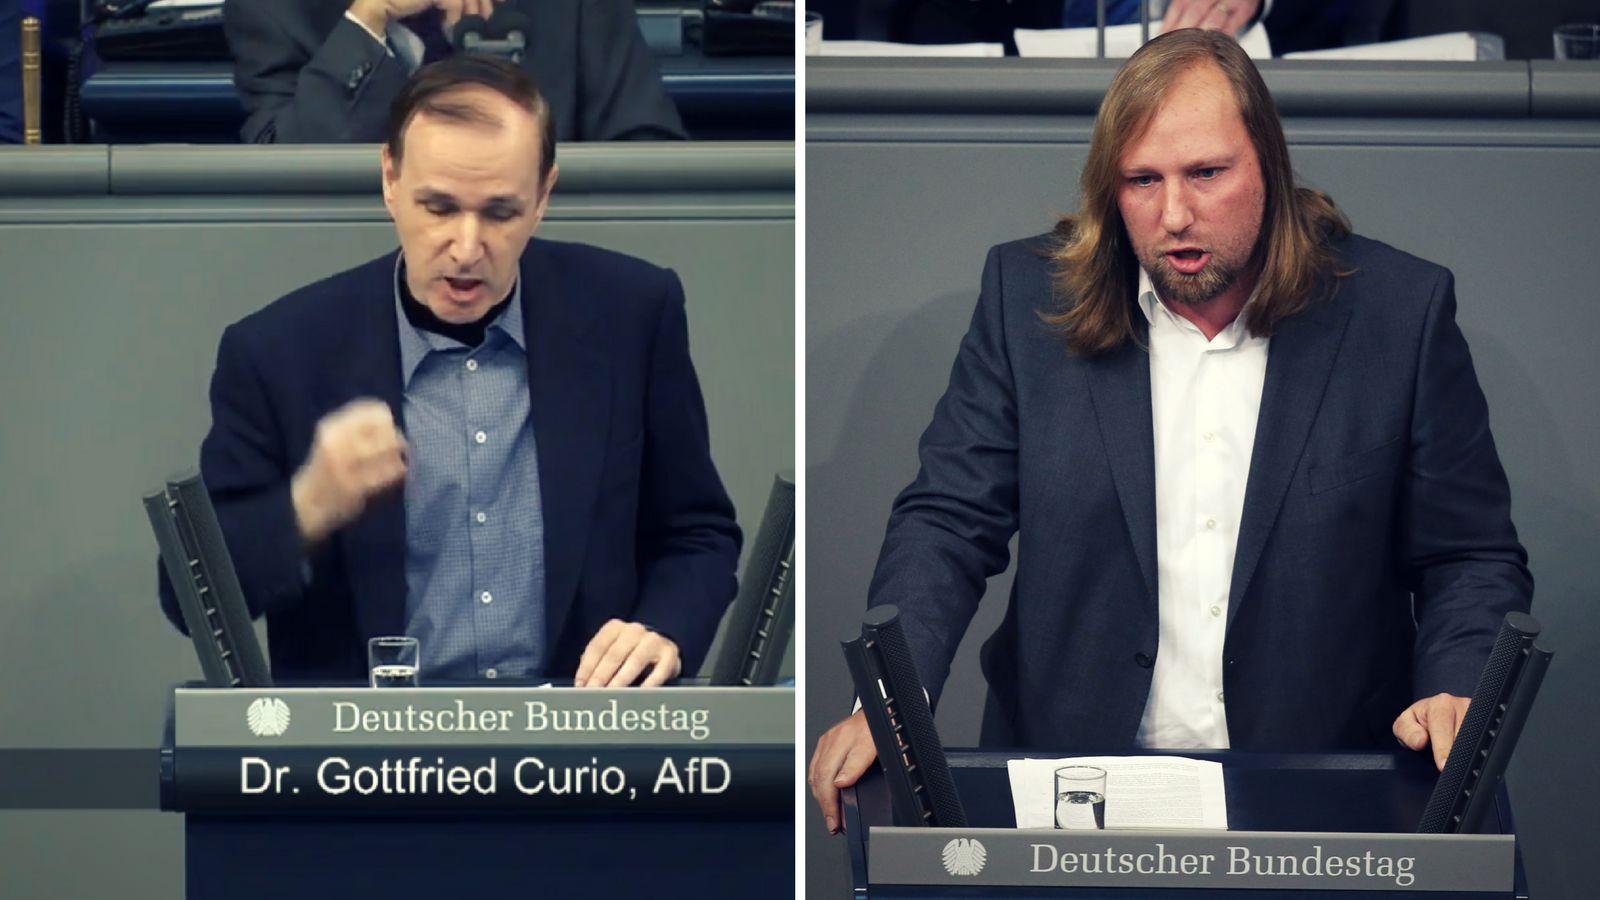 Wutduell im Bundestag: AfD-Mann hält Hetzrede – dann dreht ...